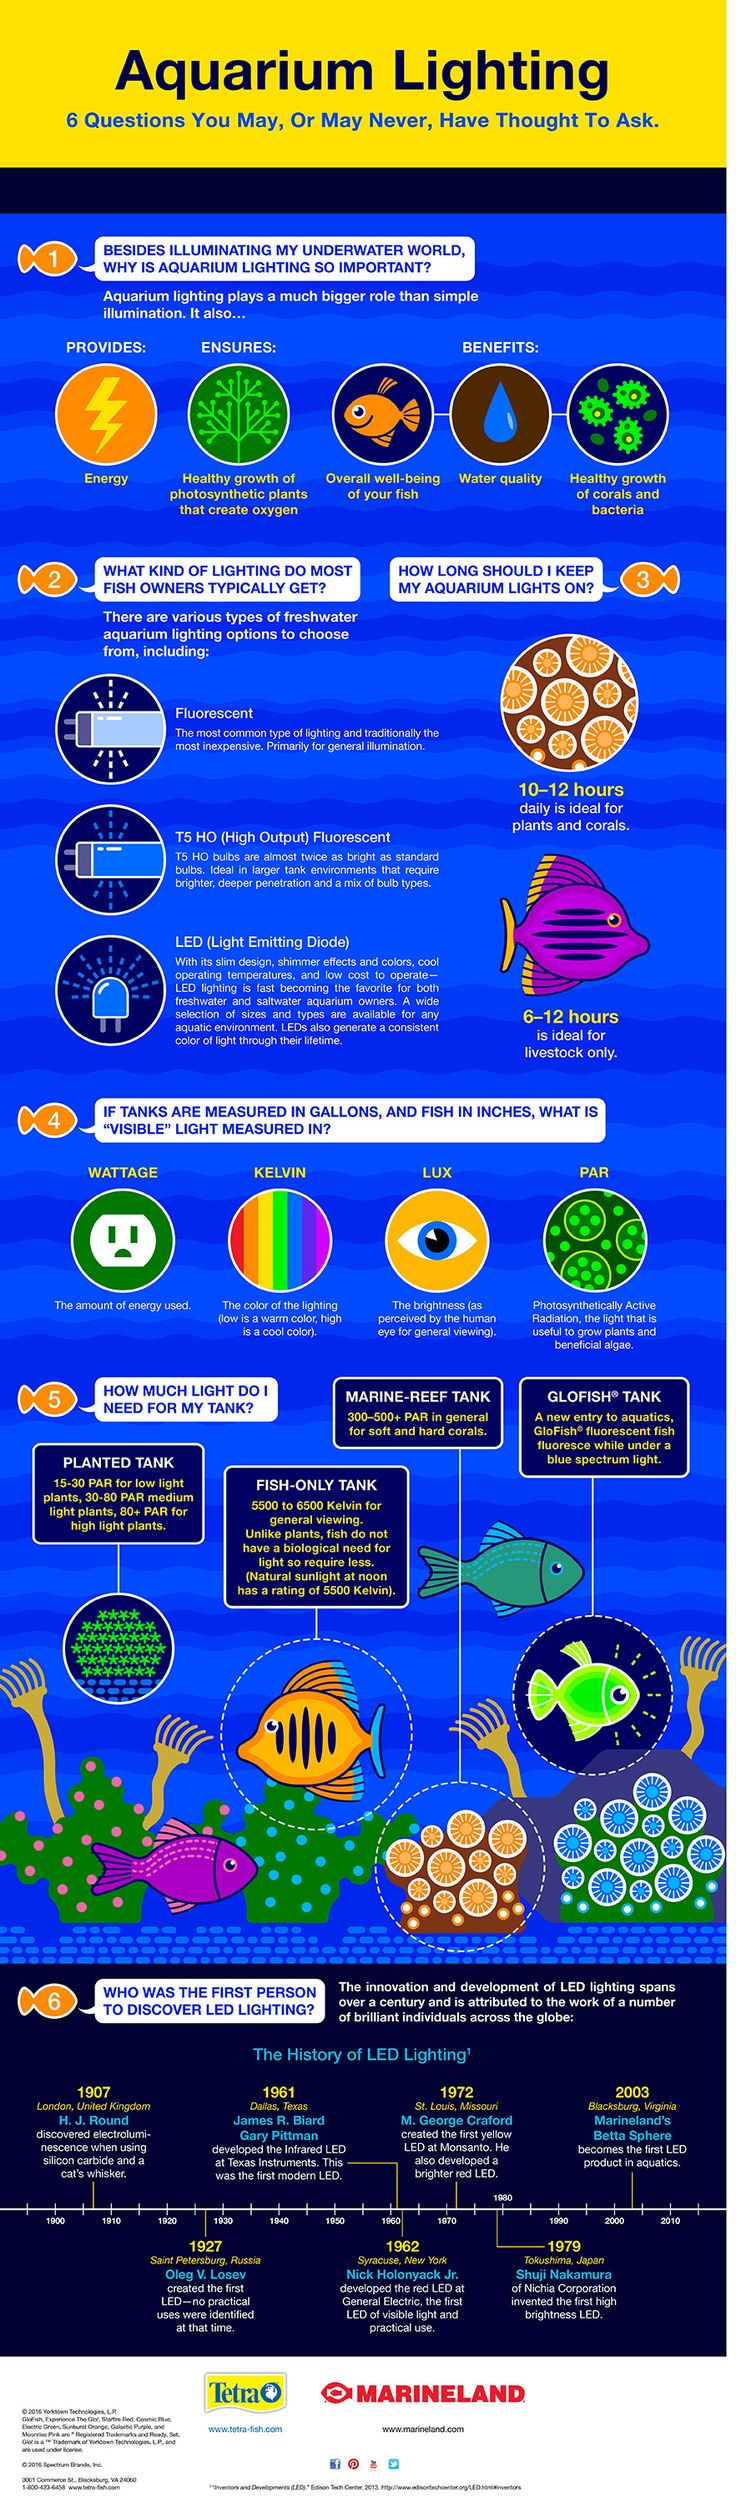 Aquarium Lighting Infographic from Marineland® Products